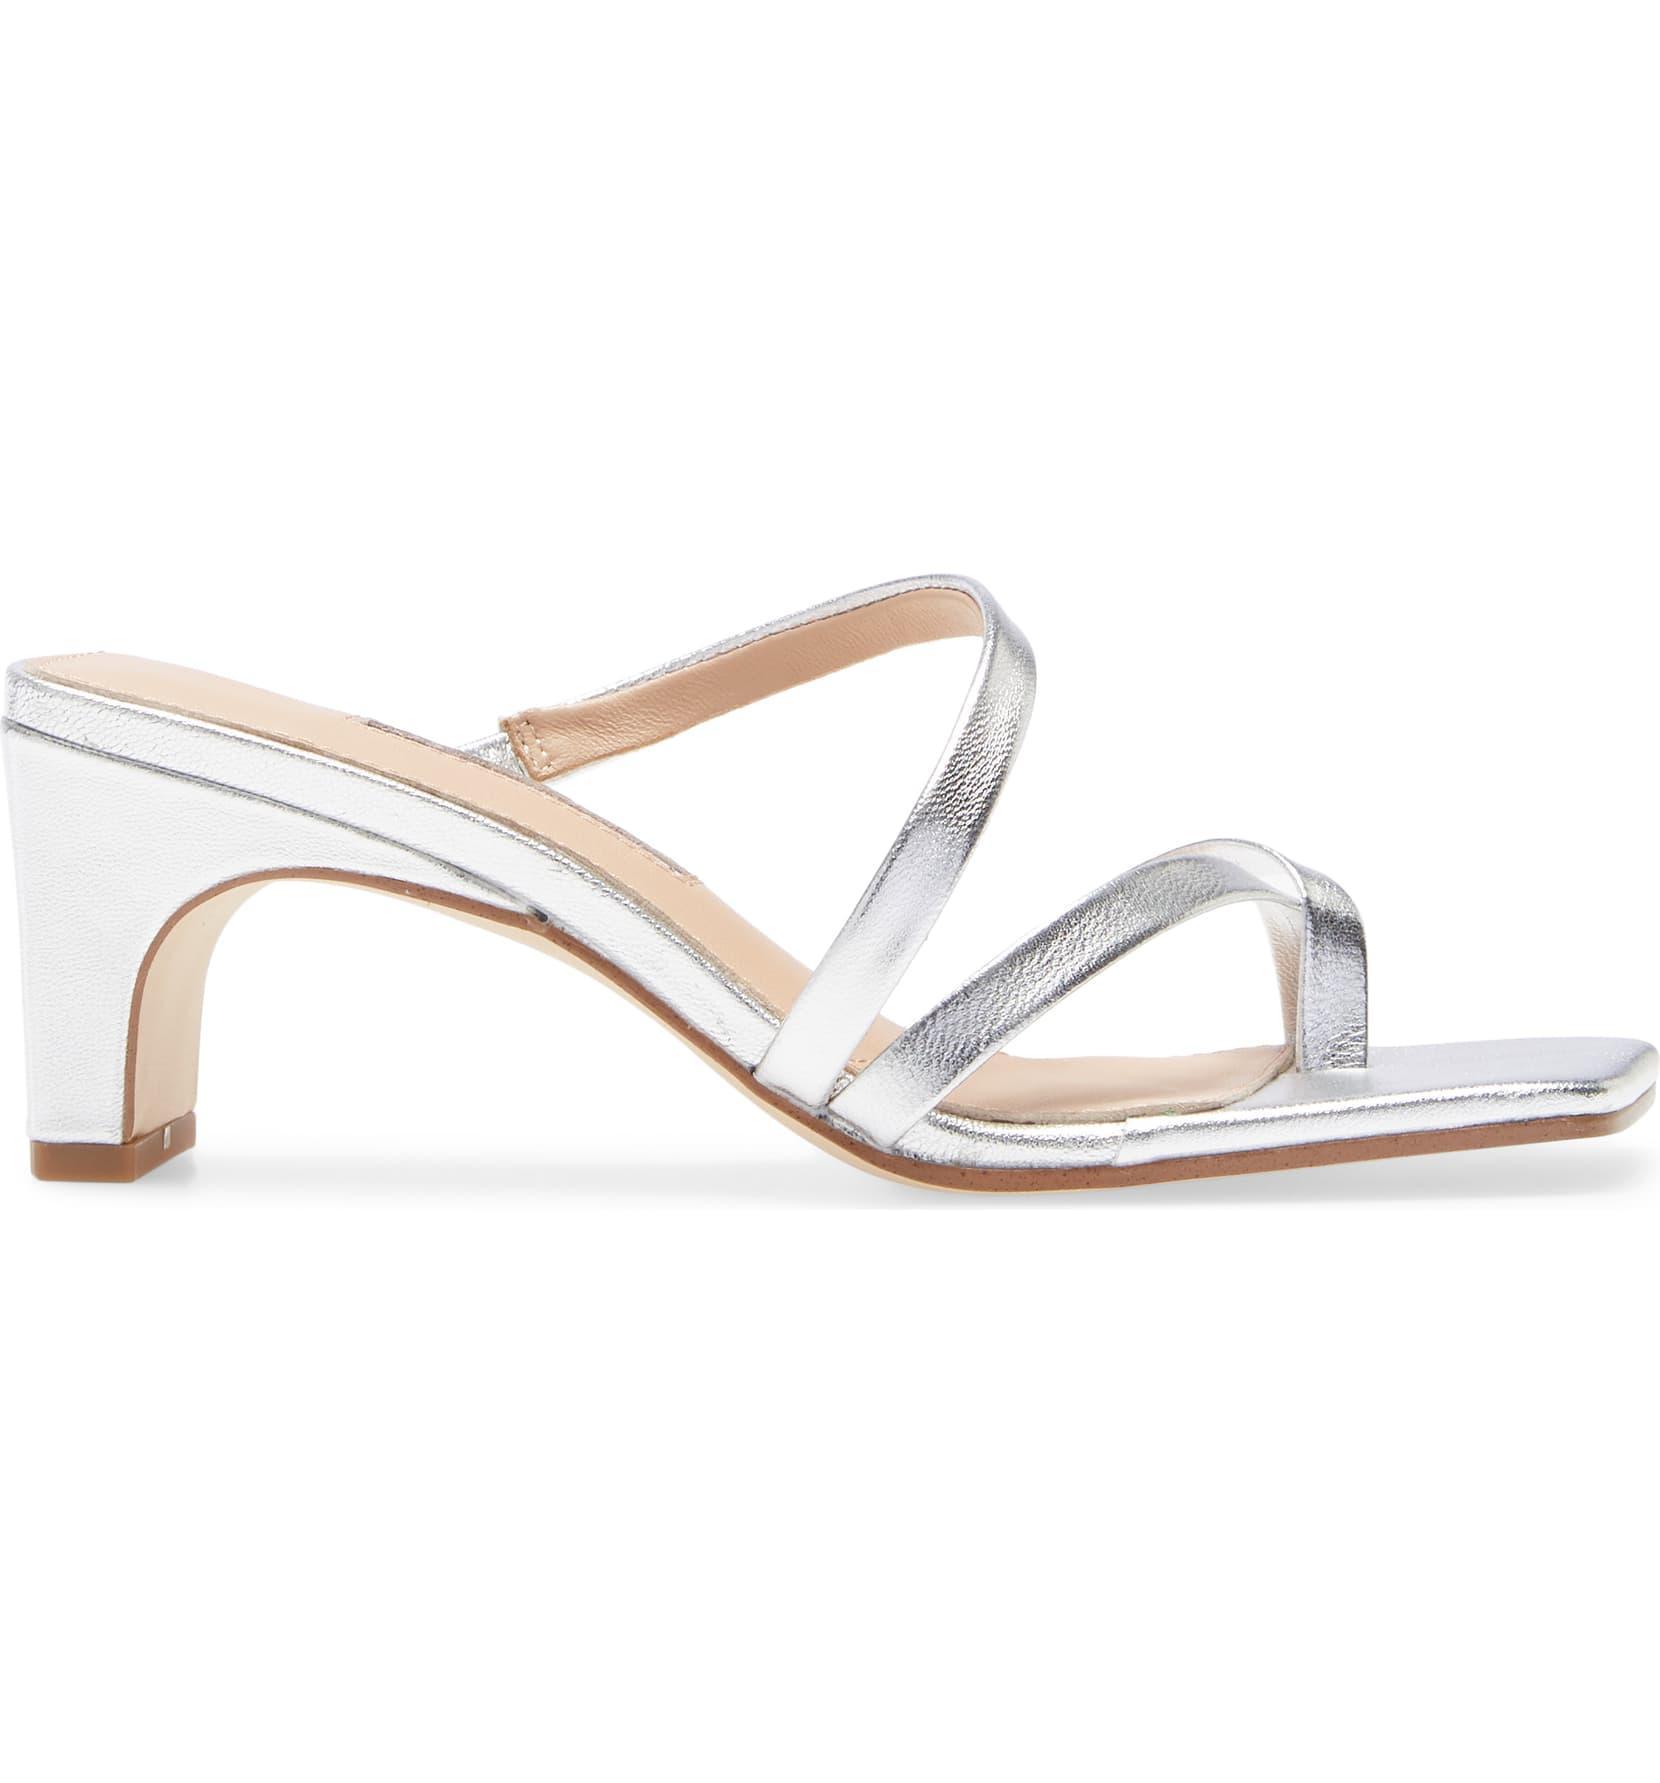 Emily Ratajkowski's Shoes Are Spring's Weirdest Sandal Trend 8